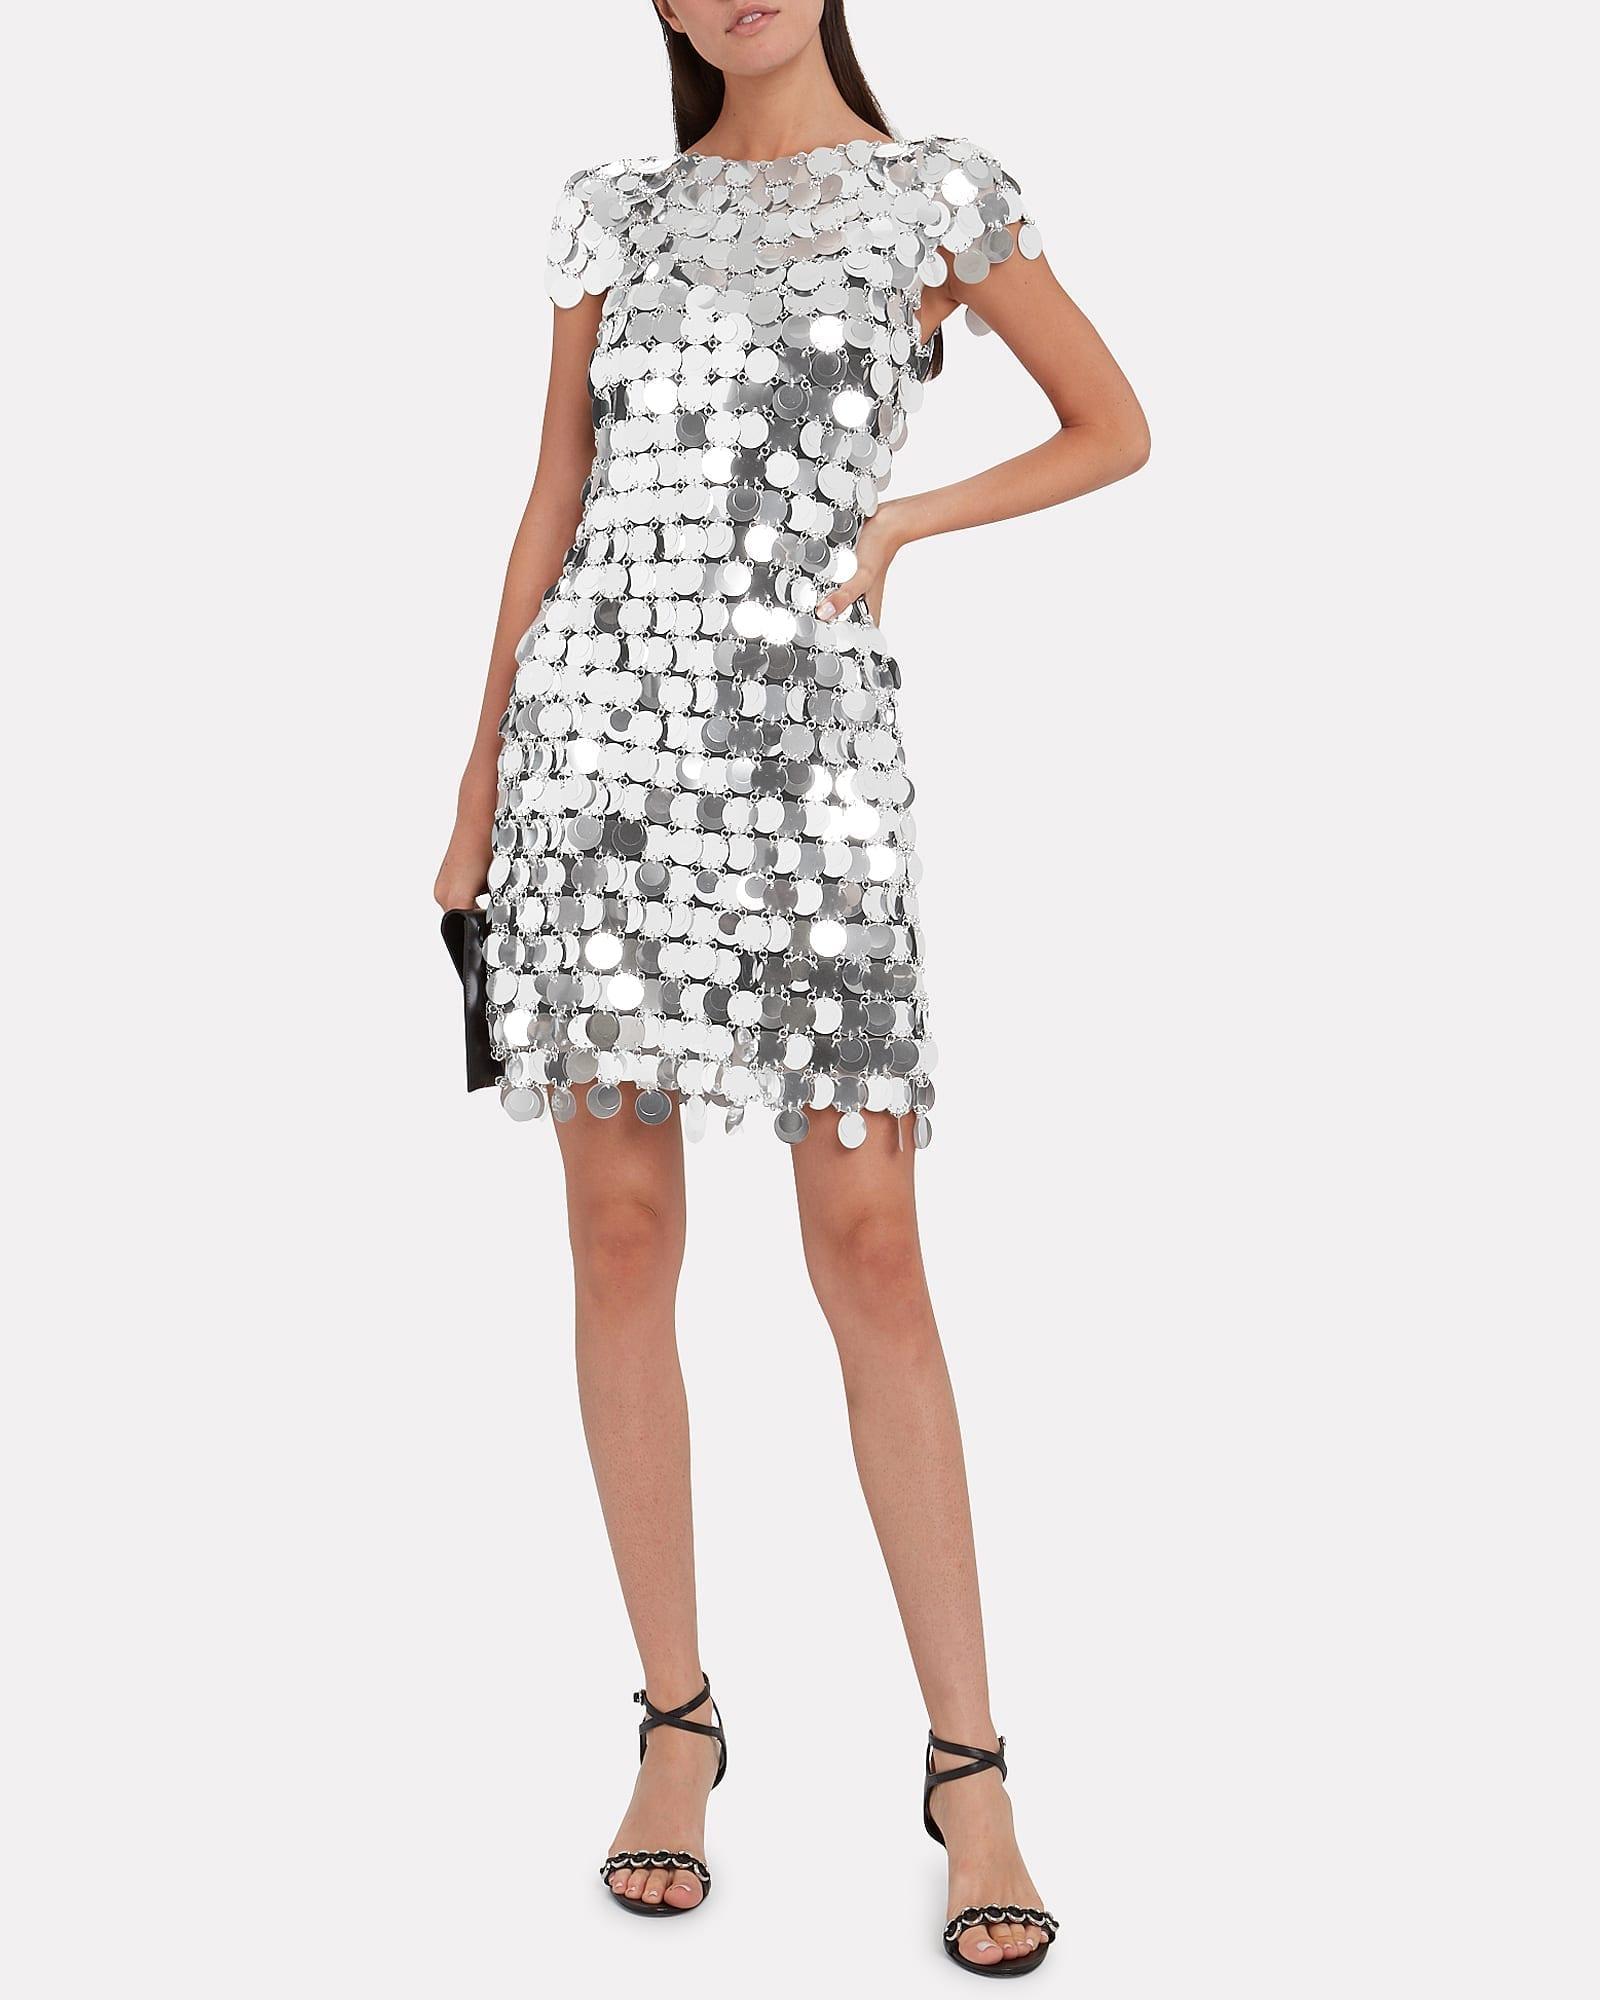 PACO RABANNE Pastilles Metallic Mini Dress